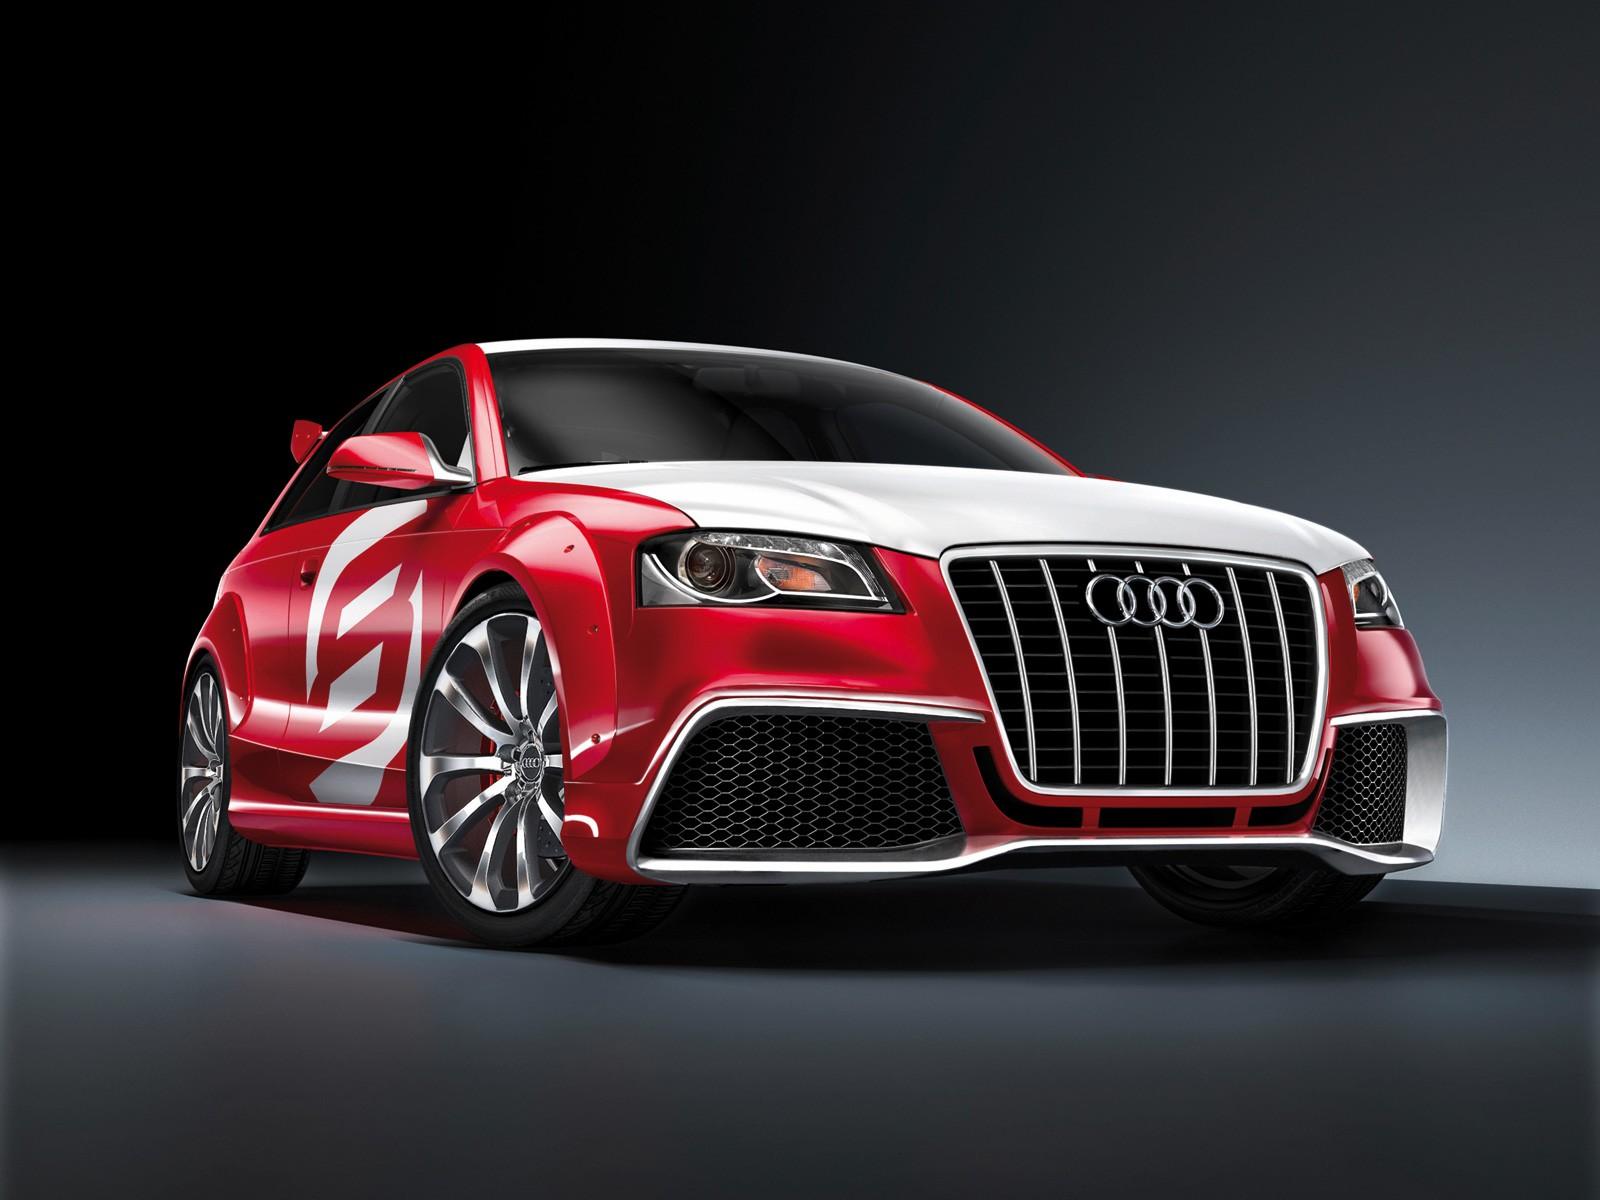 Audi-a3-tdi-clubsport-quattro-03-1-